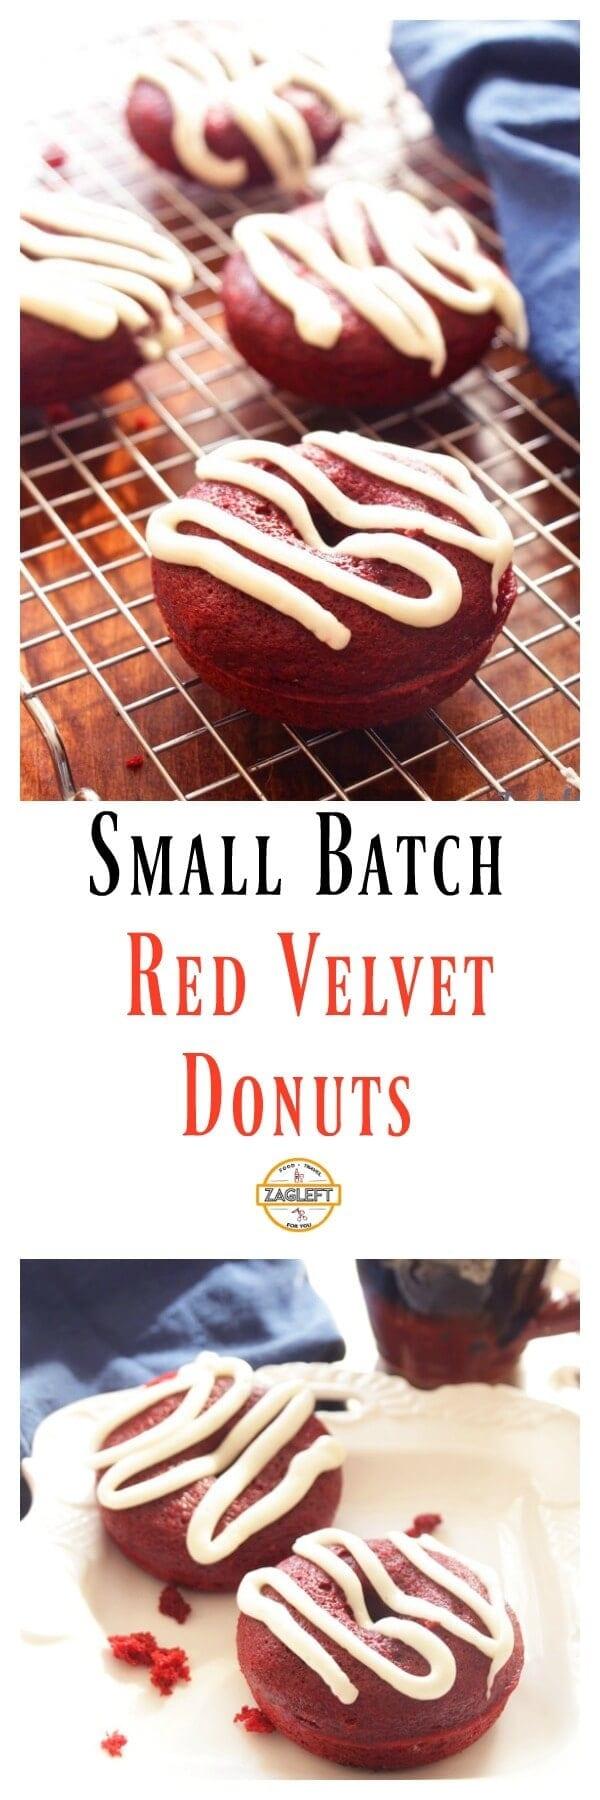 Small Batch Red Velvet Donuts ZagLeft